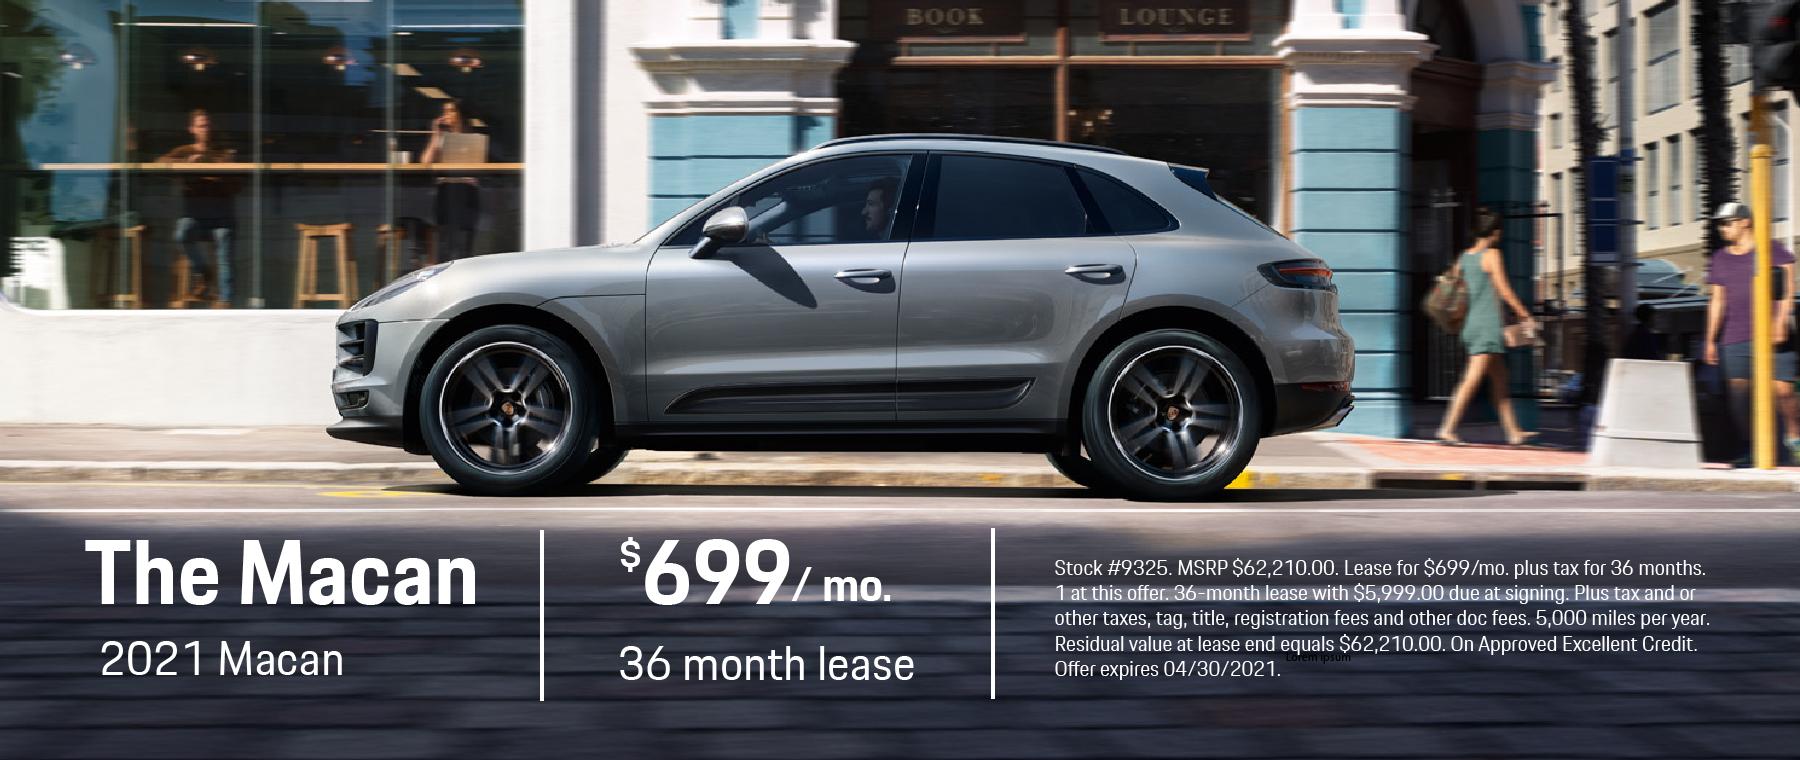 2021 Porsche Macan – Porsche Fremont April